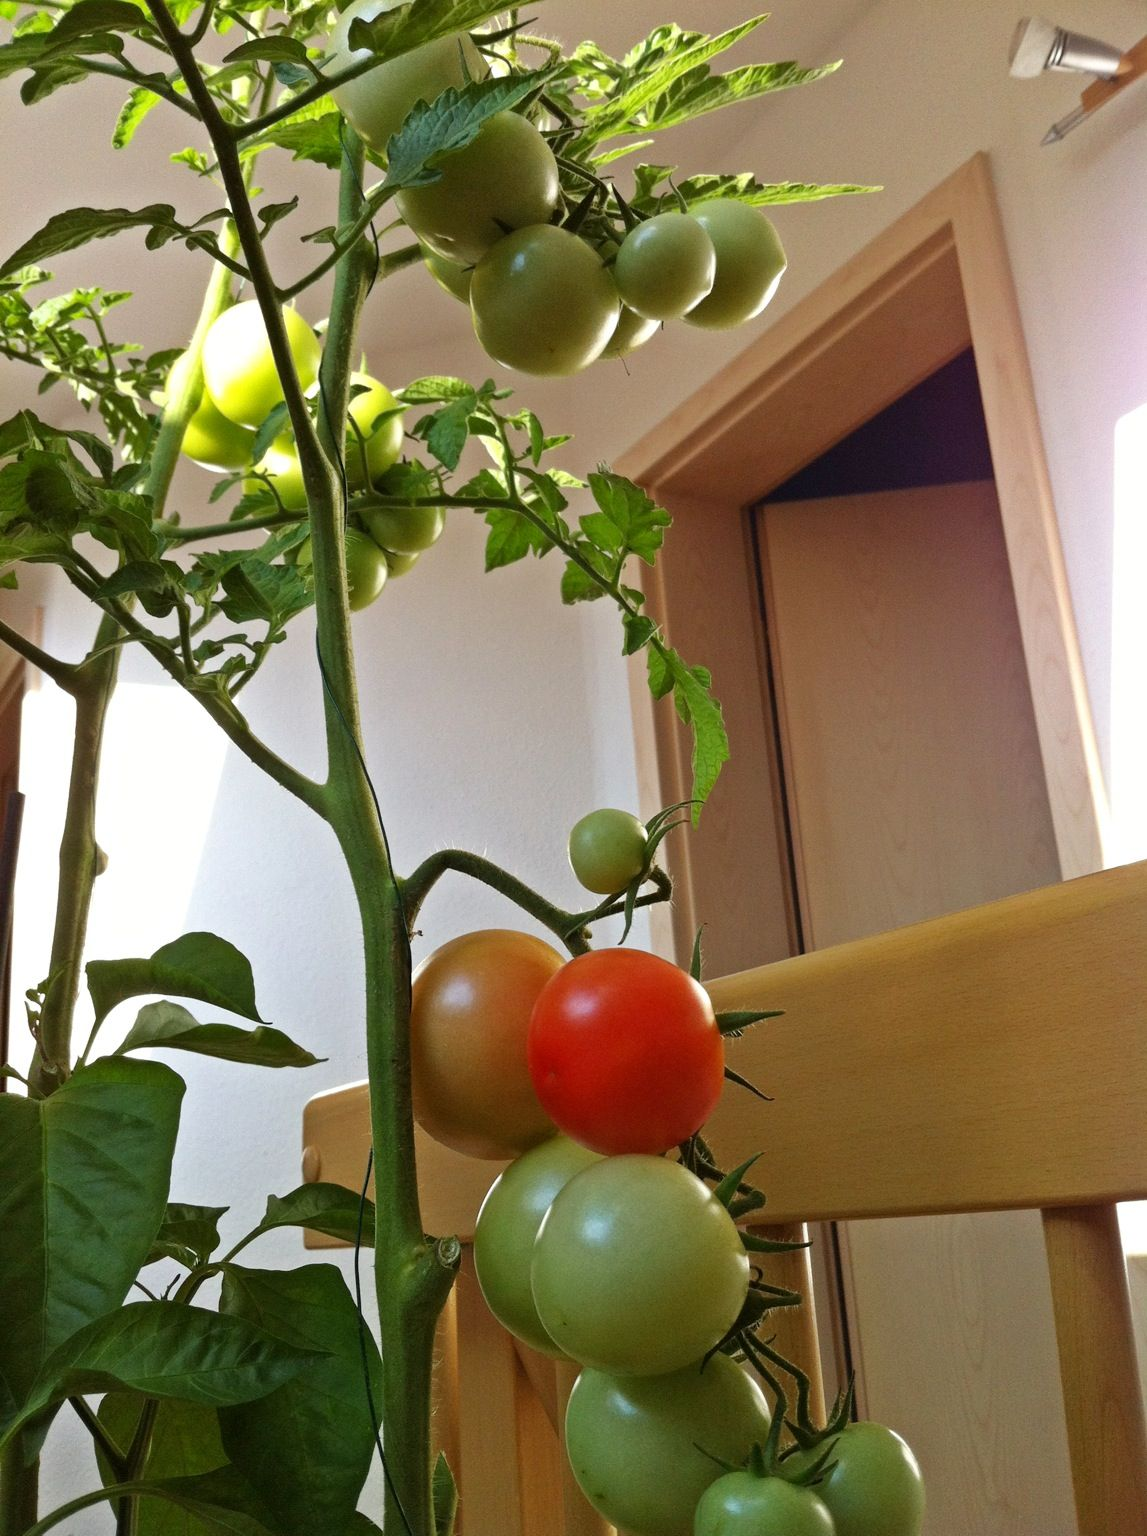 My Indoor Tomato Fertizer Coffee Grounds Banana Peel And Egg Shells Sometimes When Growing Tomatoes Indoors Growing Tomatoes In Containers Growing Indoors